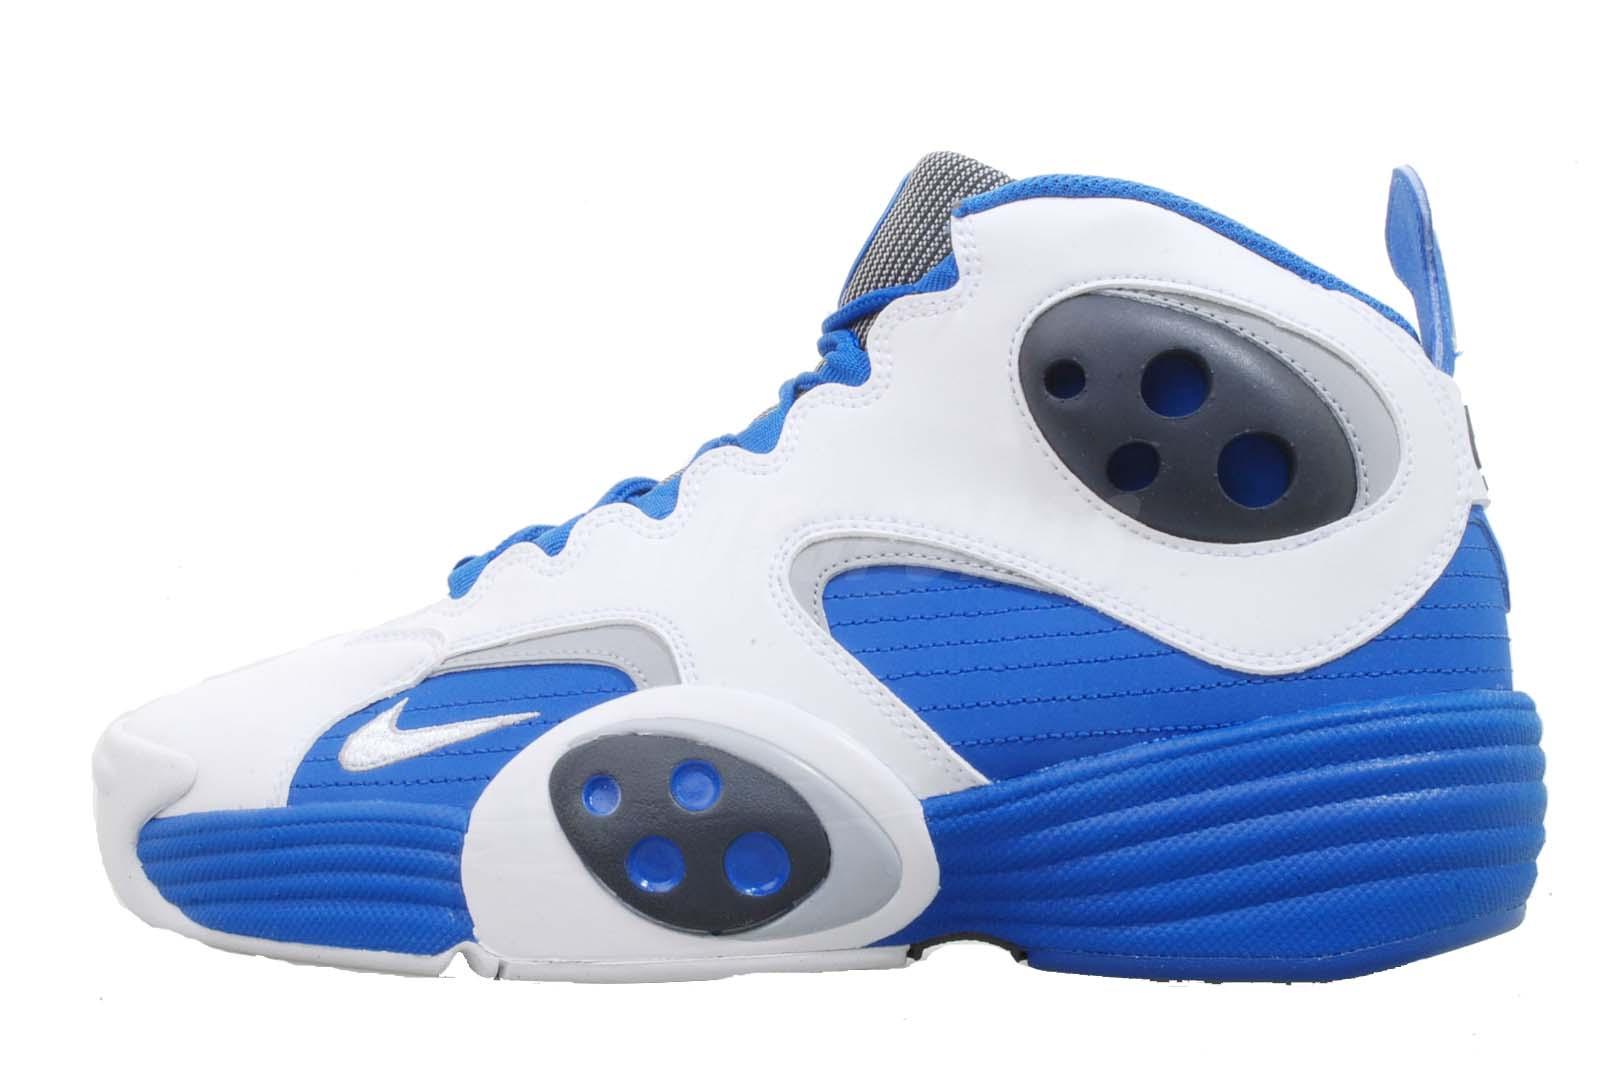 Nike Flight One Penny Hardaway 1 Orlando Magic Basketball ...